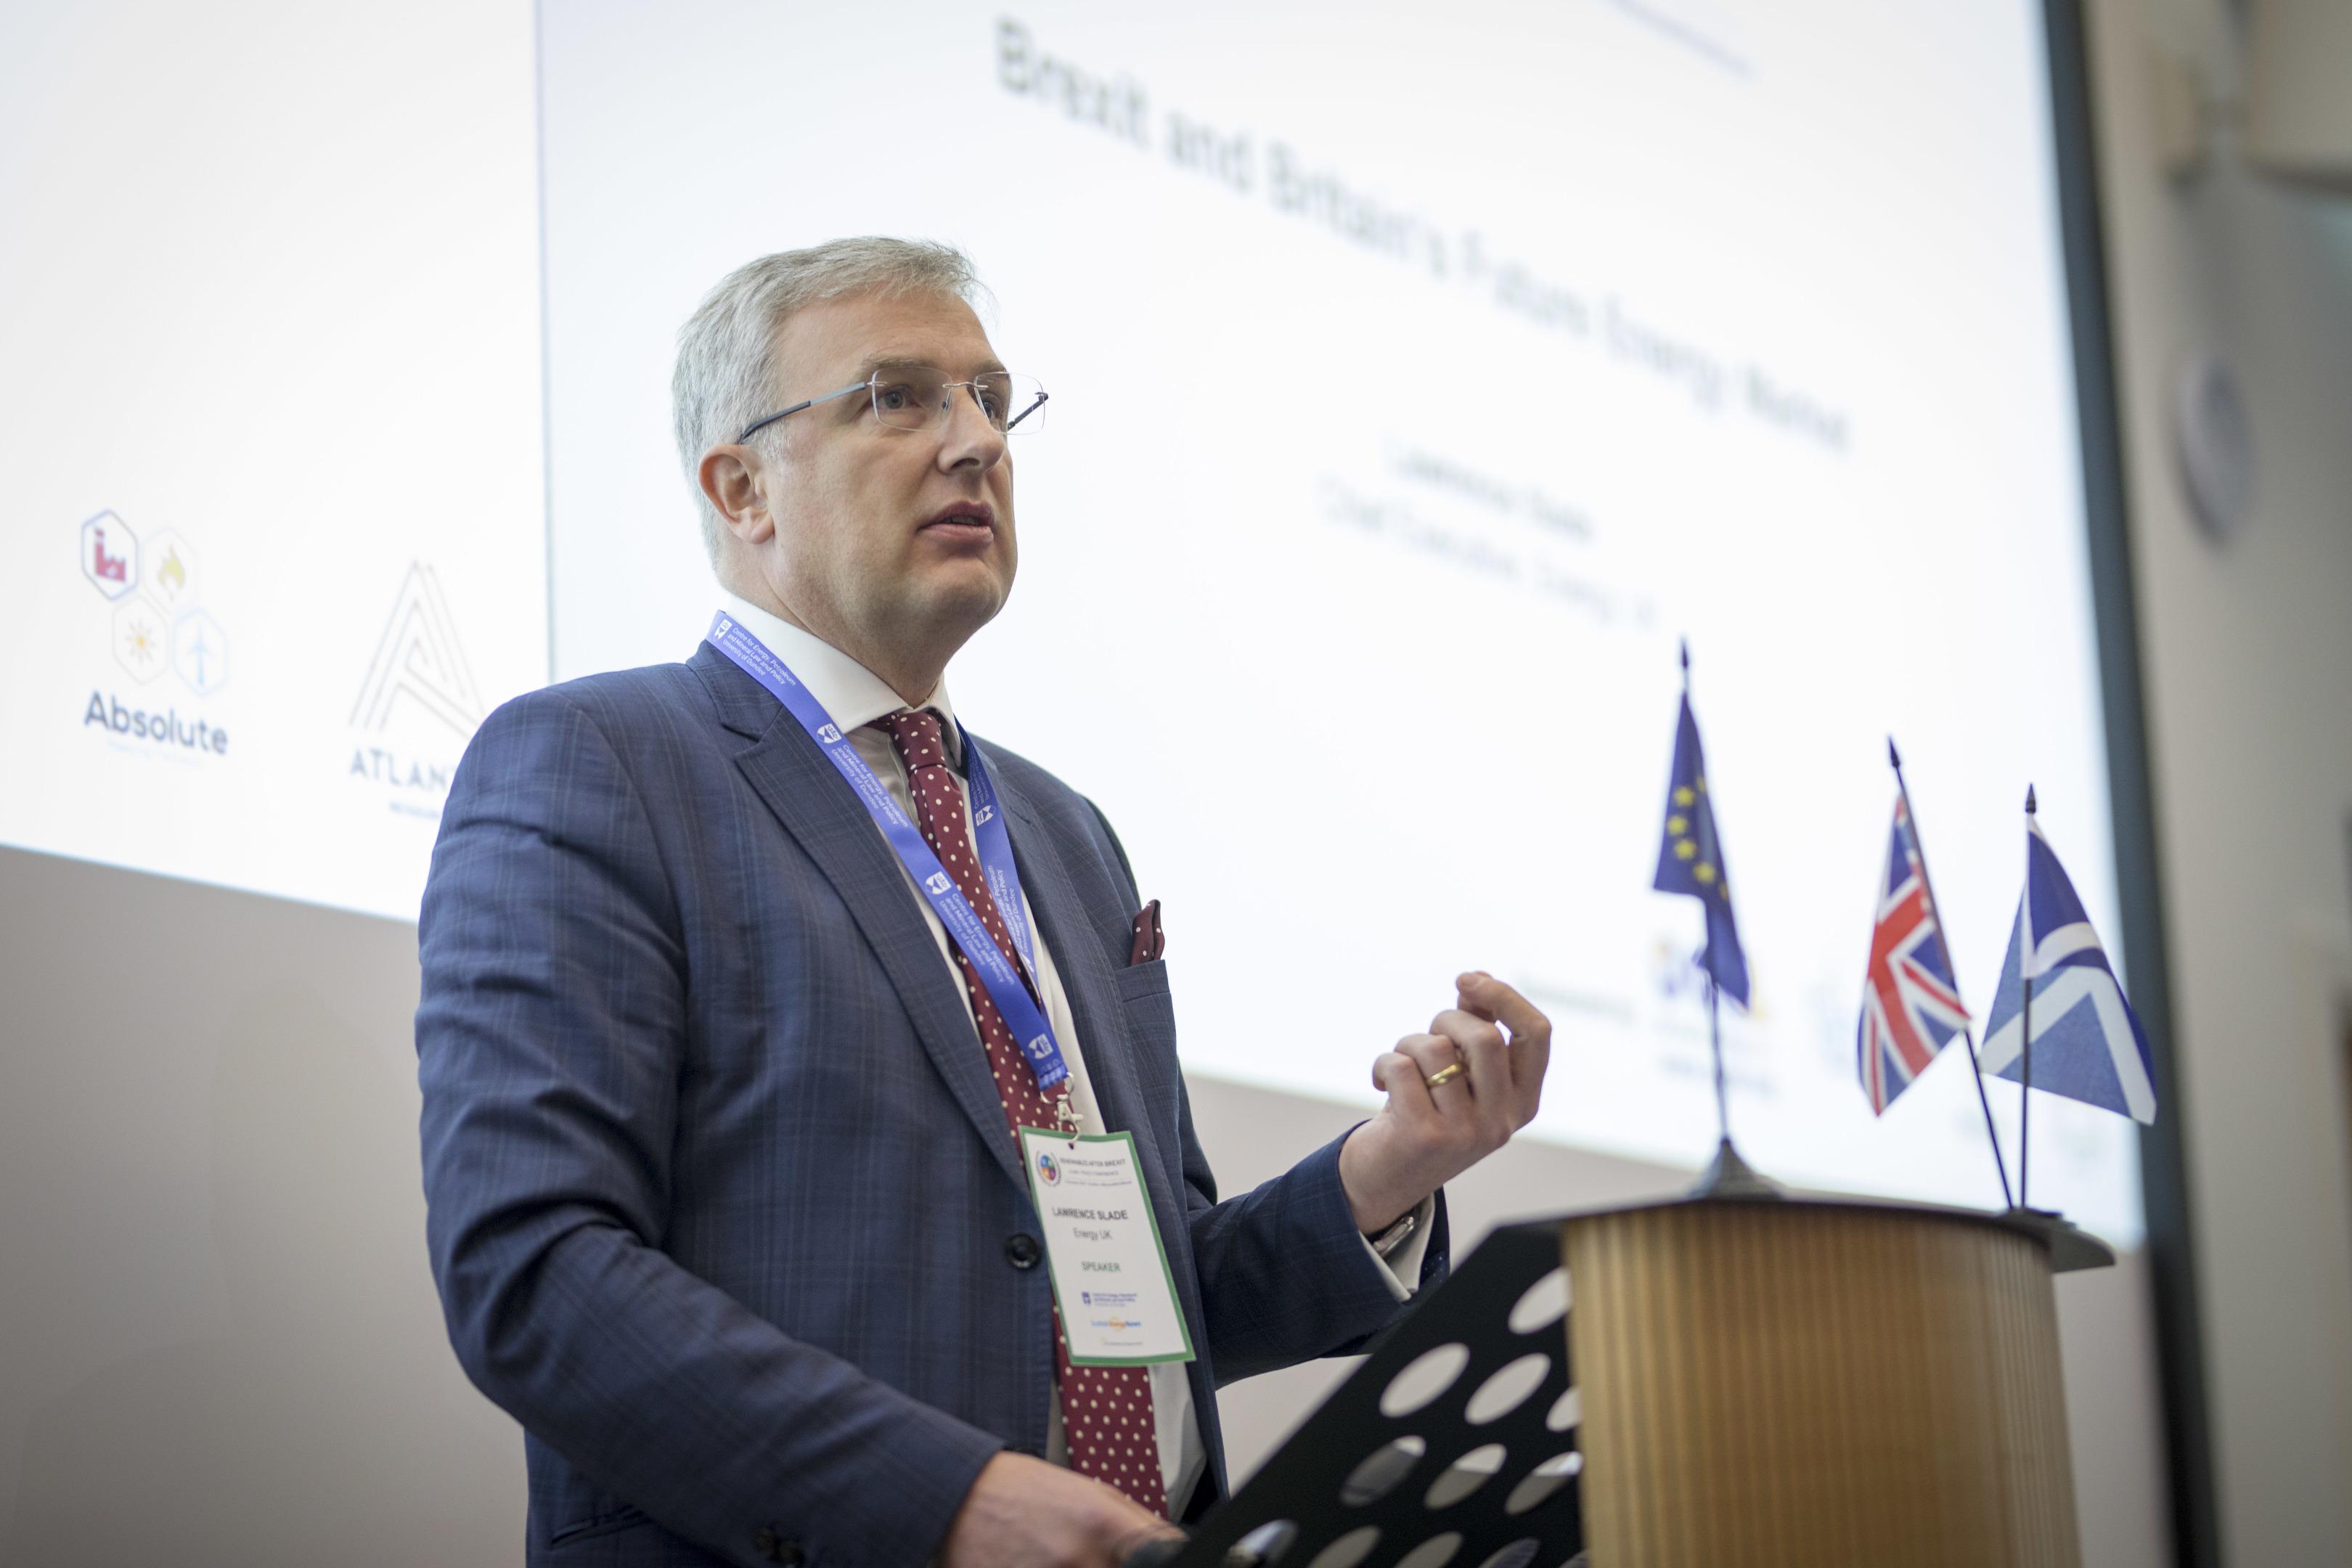 Energy UK chief executive Lawrence Slade. Photography by Dundee University